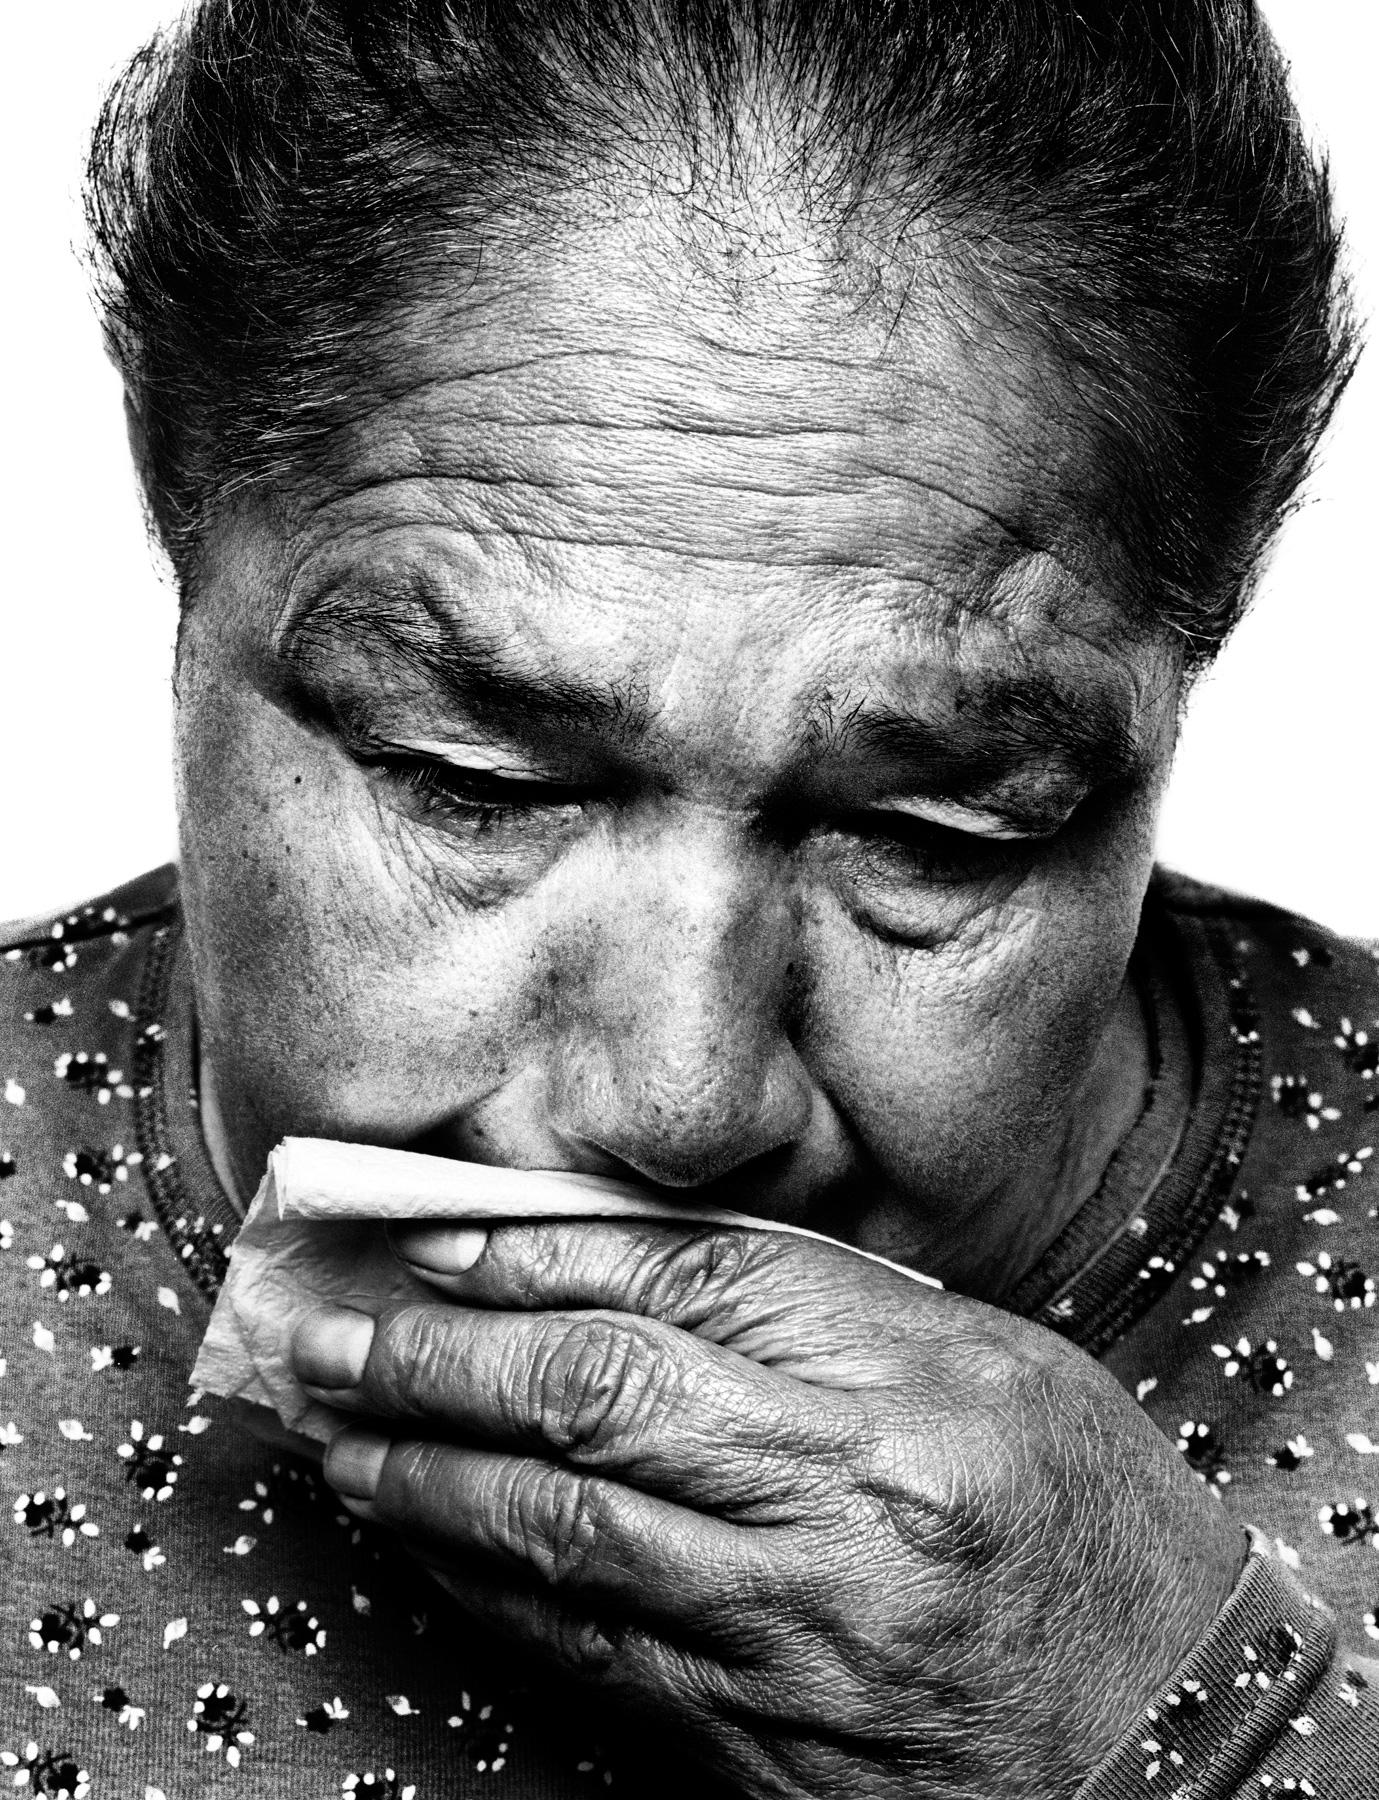 Marta Garcia, 53 | Tijuana, Mexico | Aug. 2, 2013